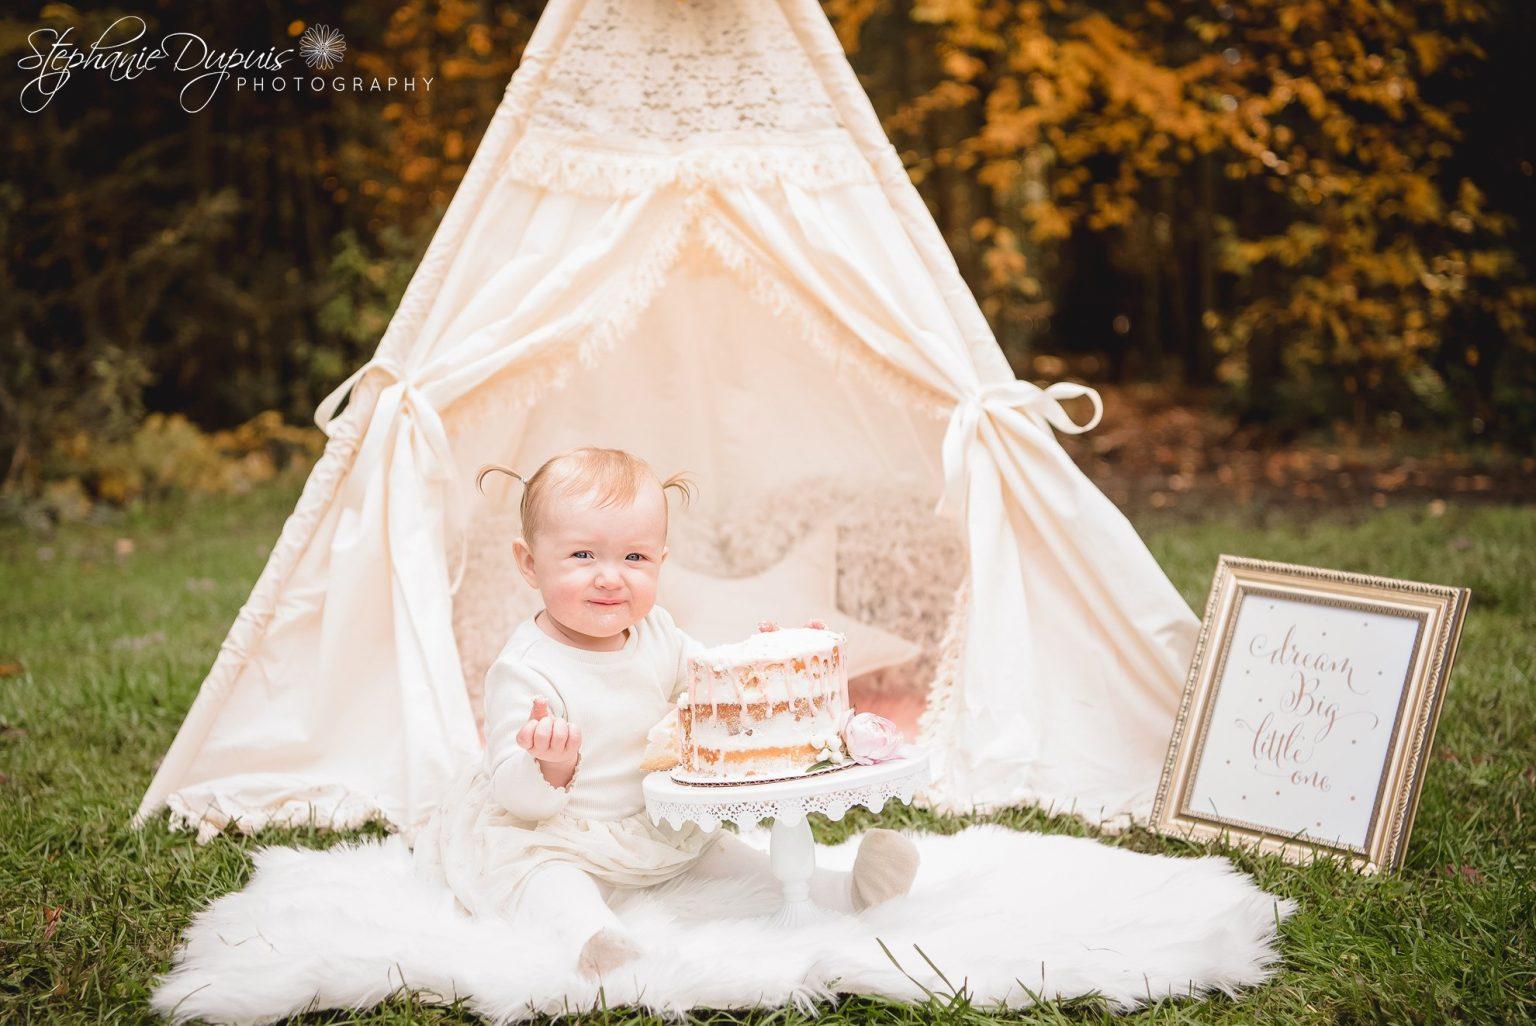 bromley cake smash 12 1536x1026 - Portfolio: Laura Mae Cake Smash